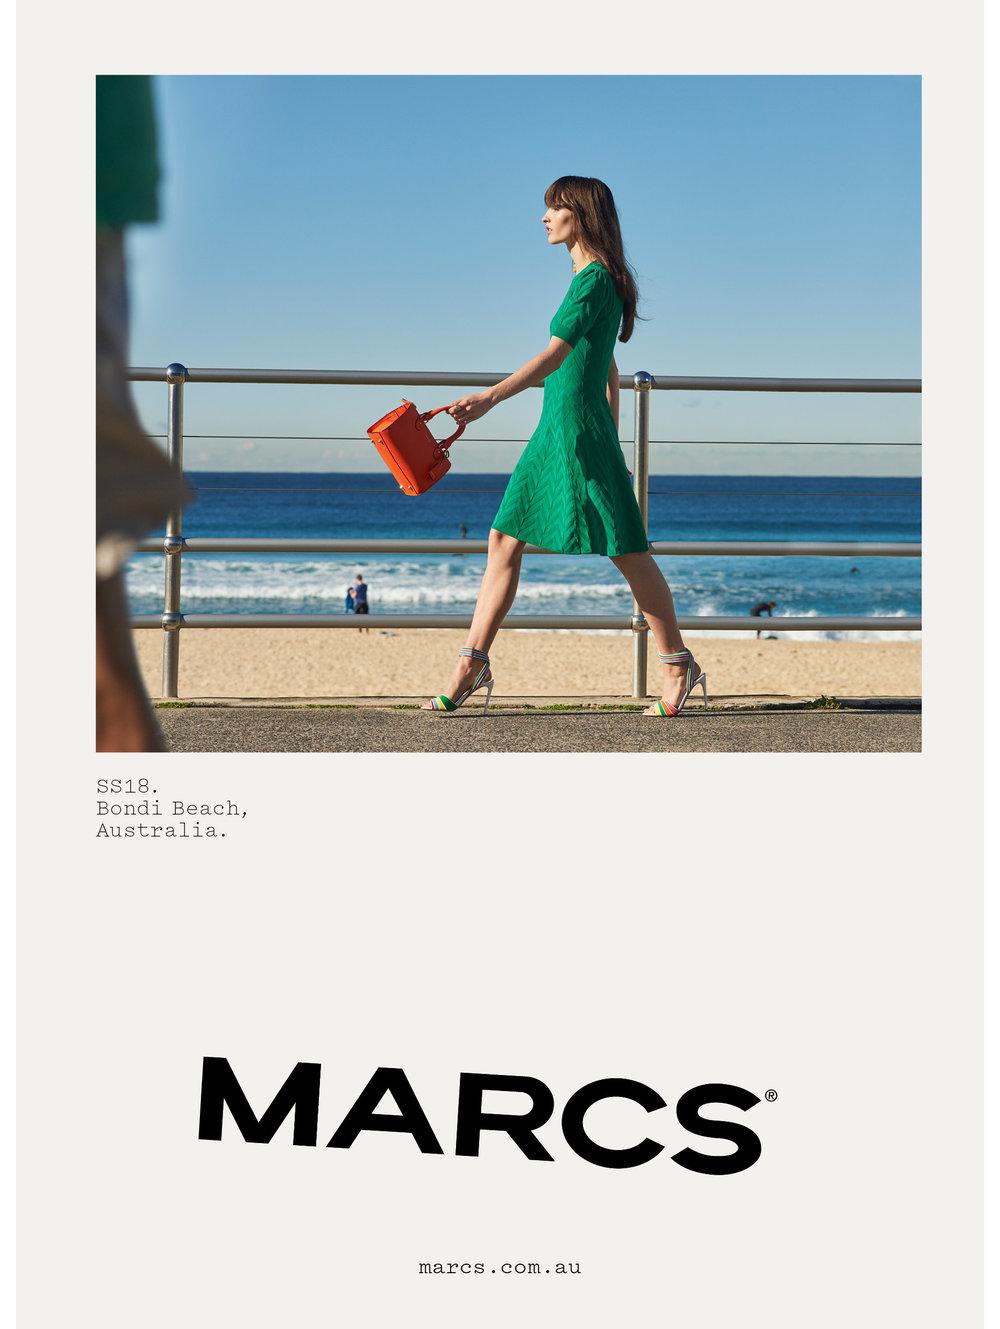 Marcs4.jpg